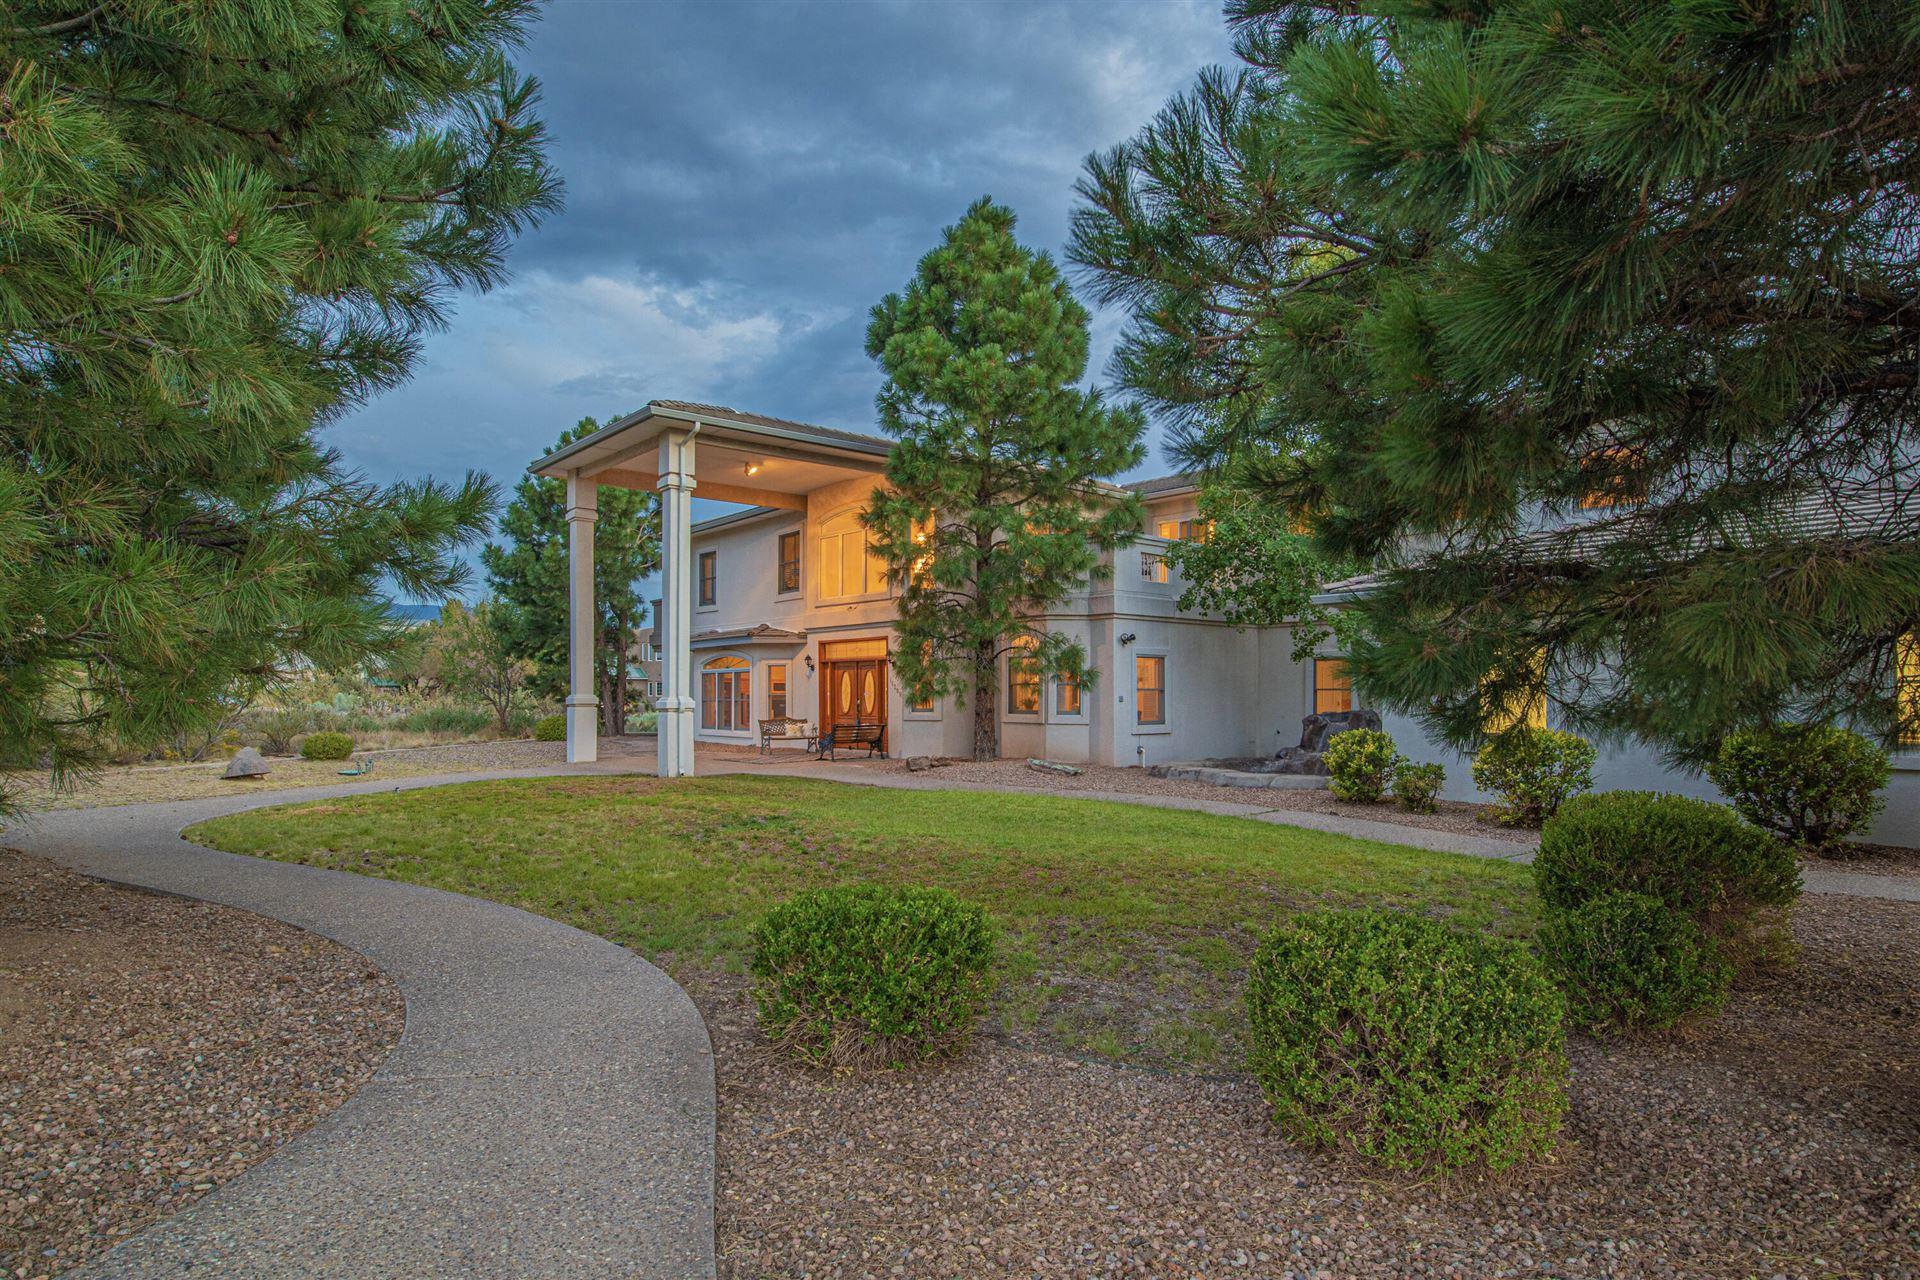 Photo of 11200 ELENA Drive NE, Albuquerque, NM 87122 (MLS # 1000396)